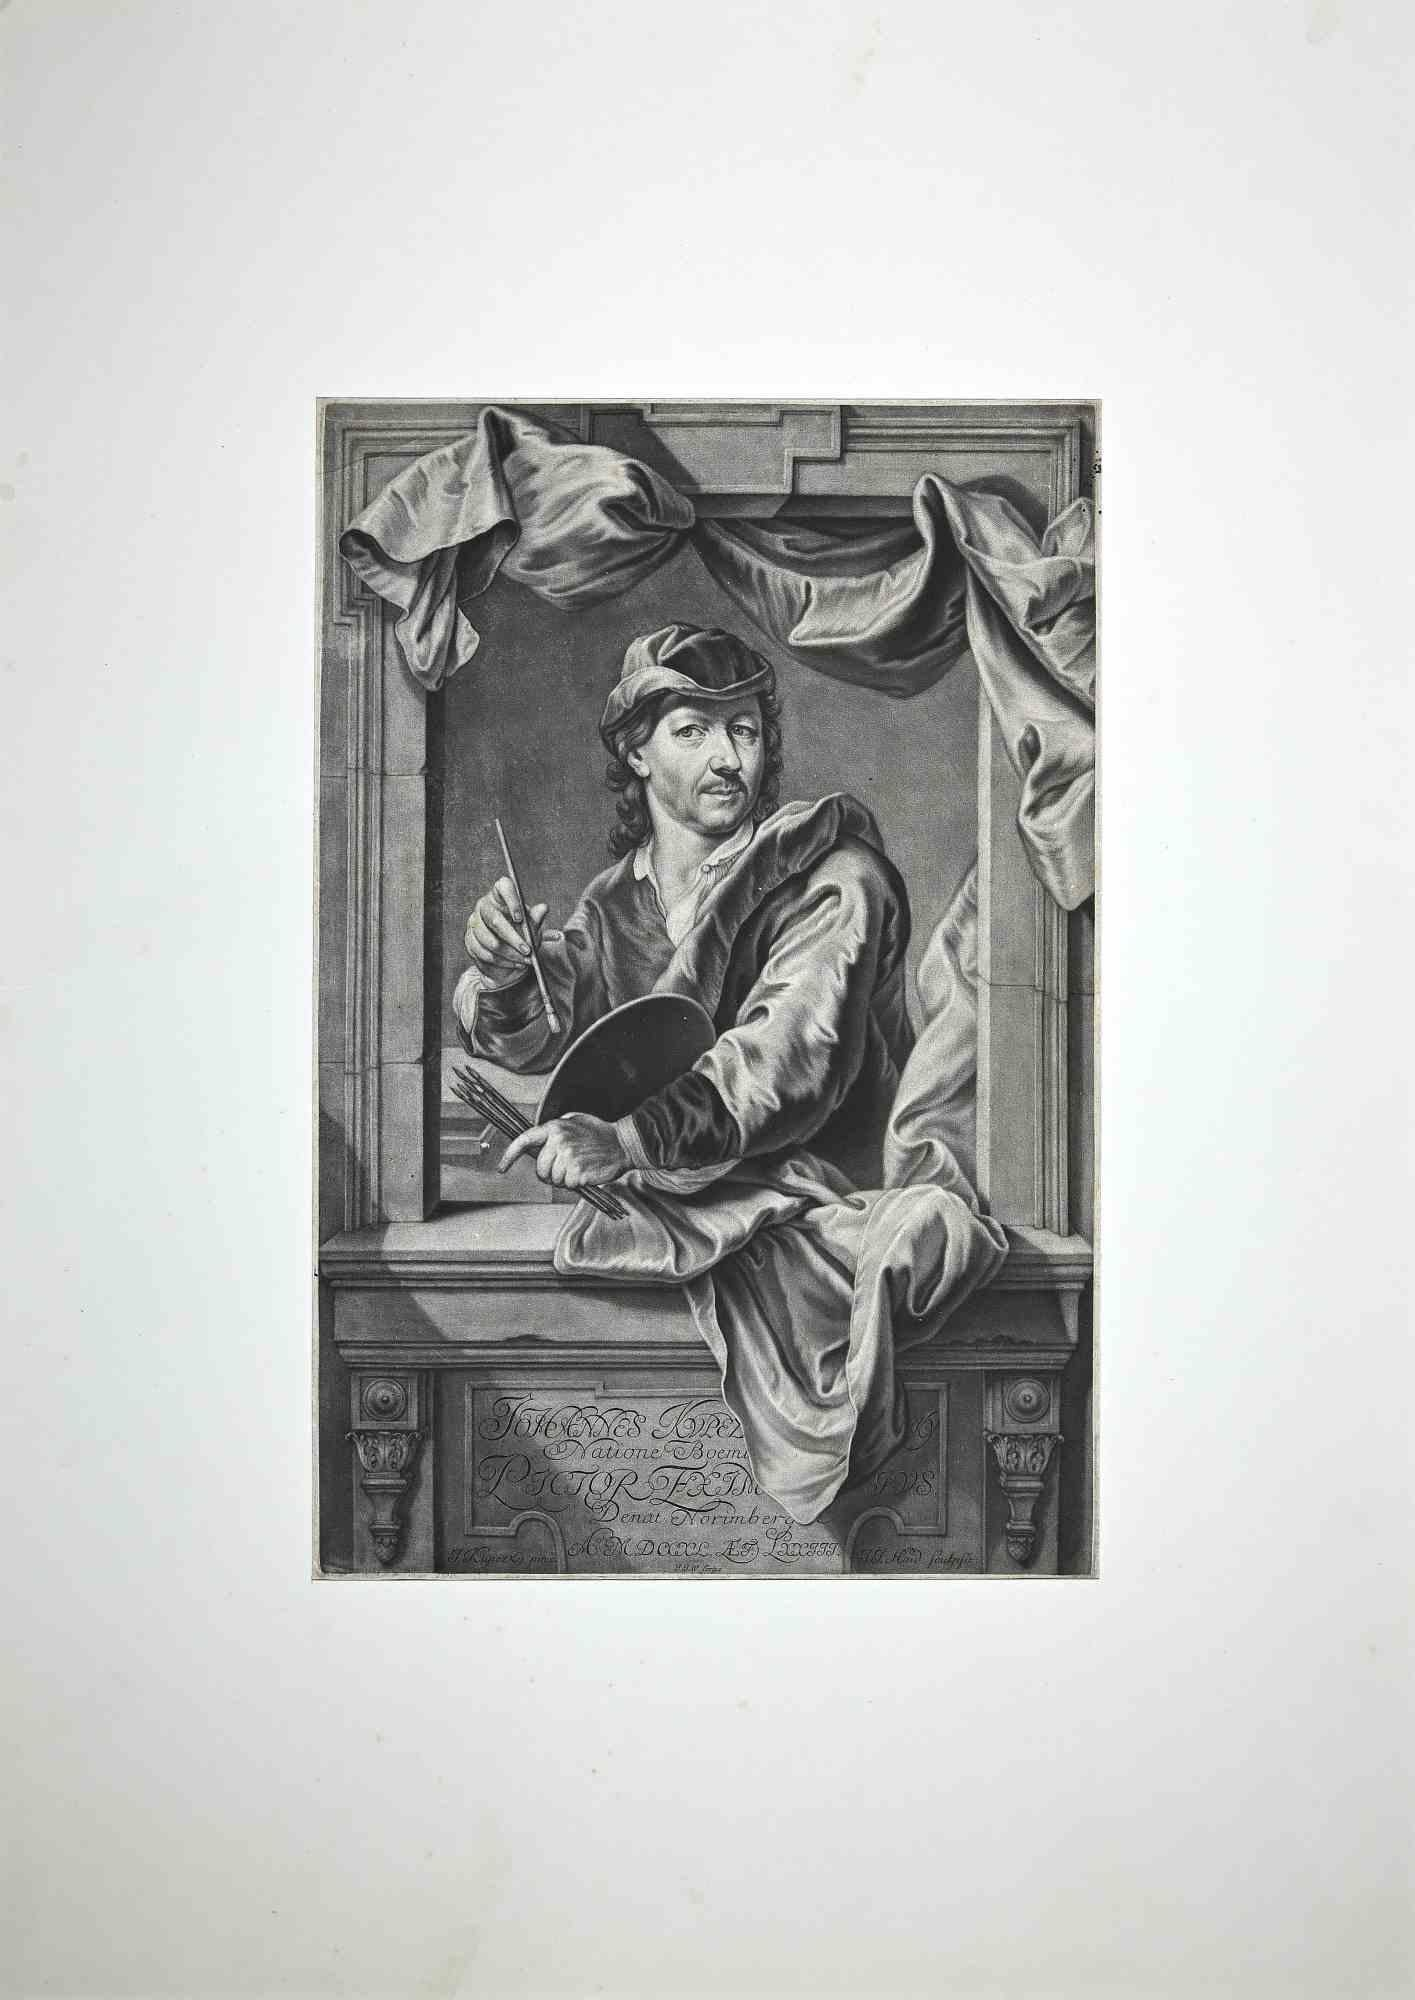 Portrait of Sculptor John Michael Rysbrack - Mezzotint by John Faber II - 1734